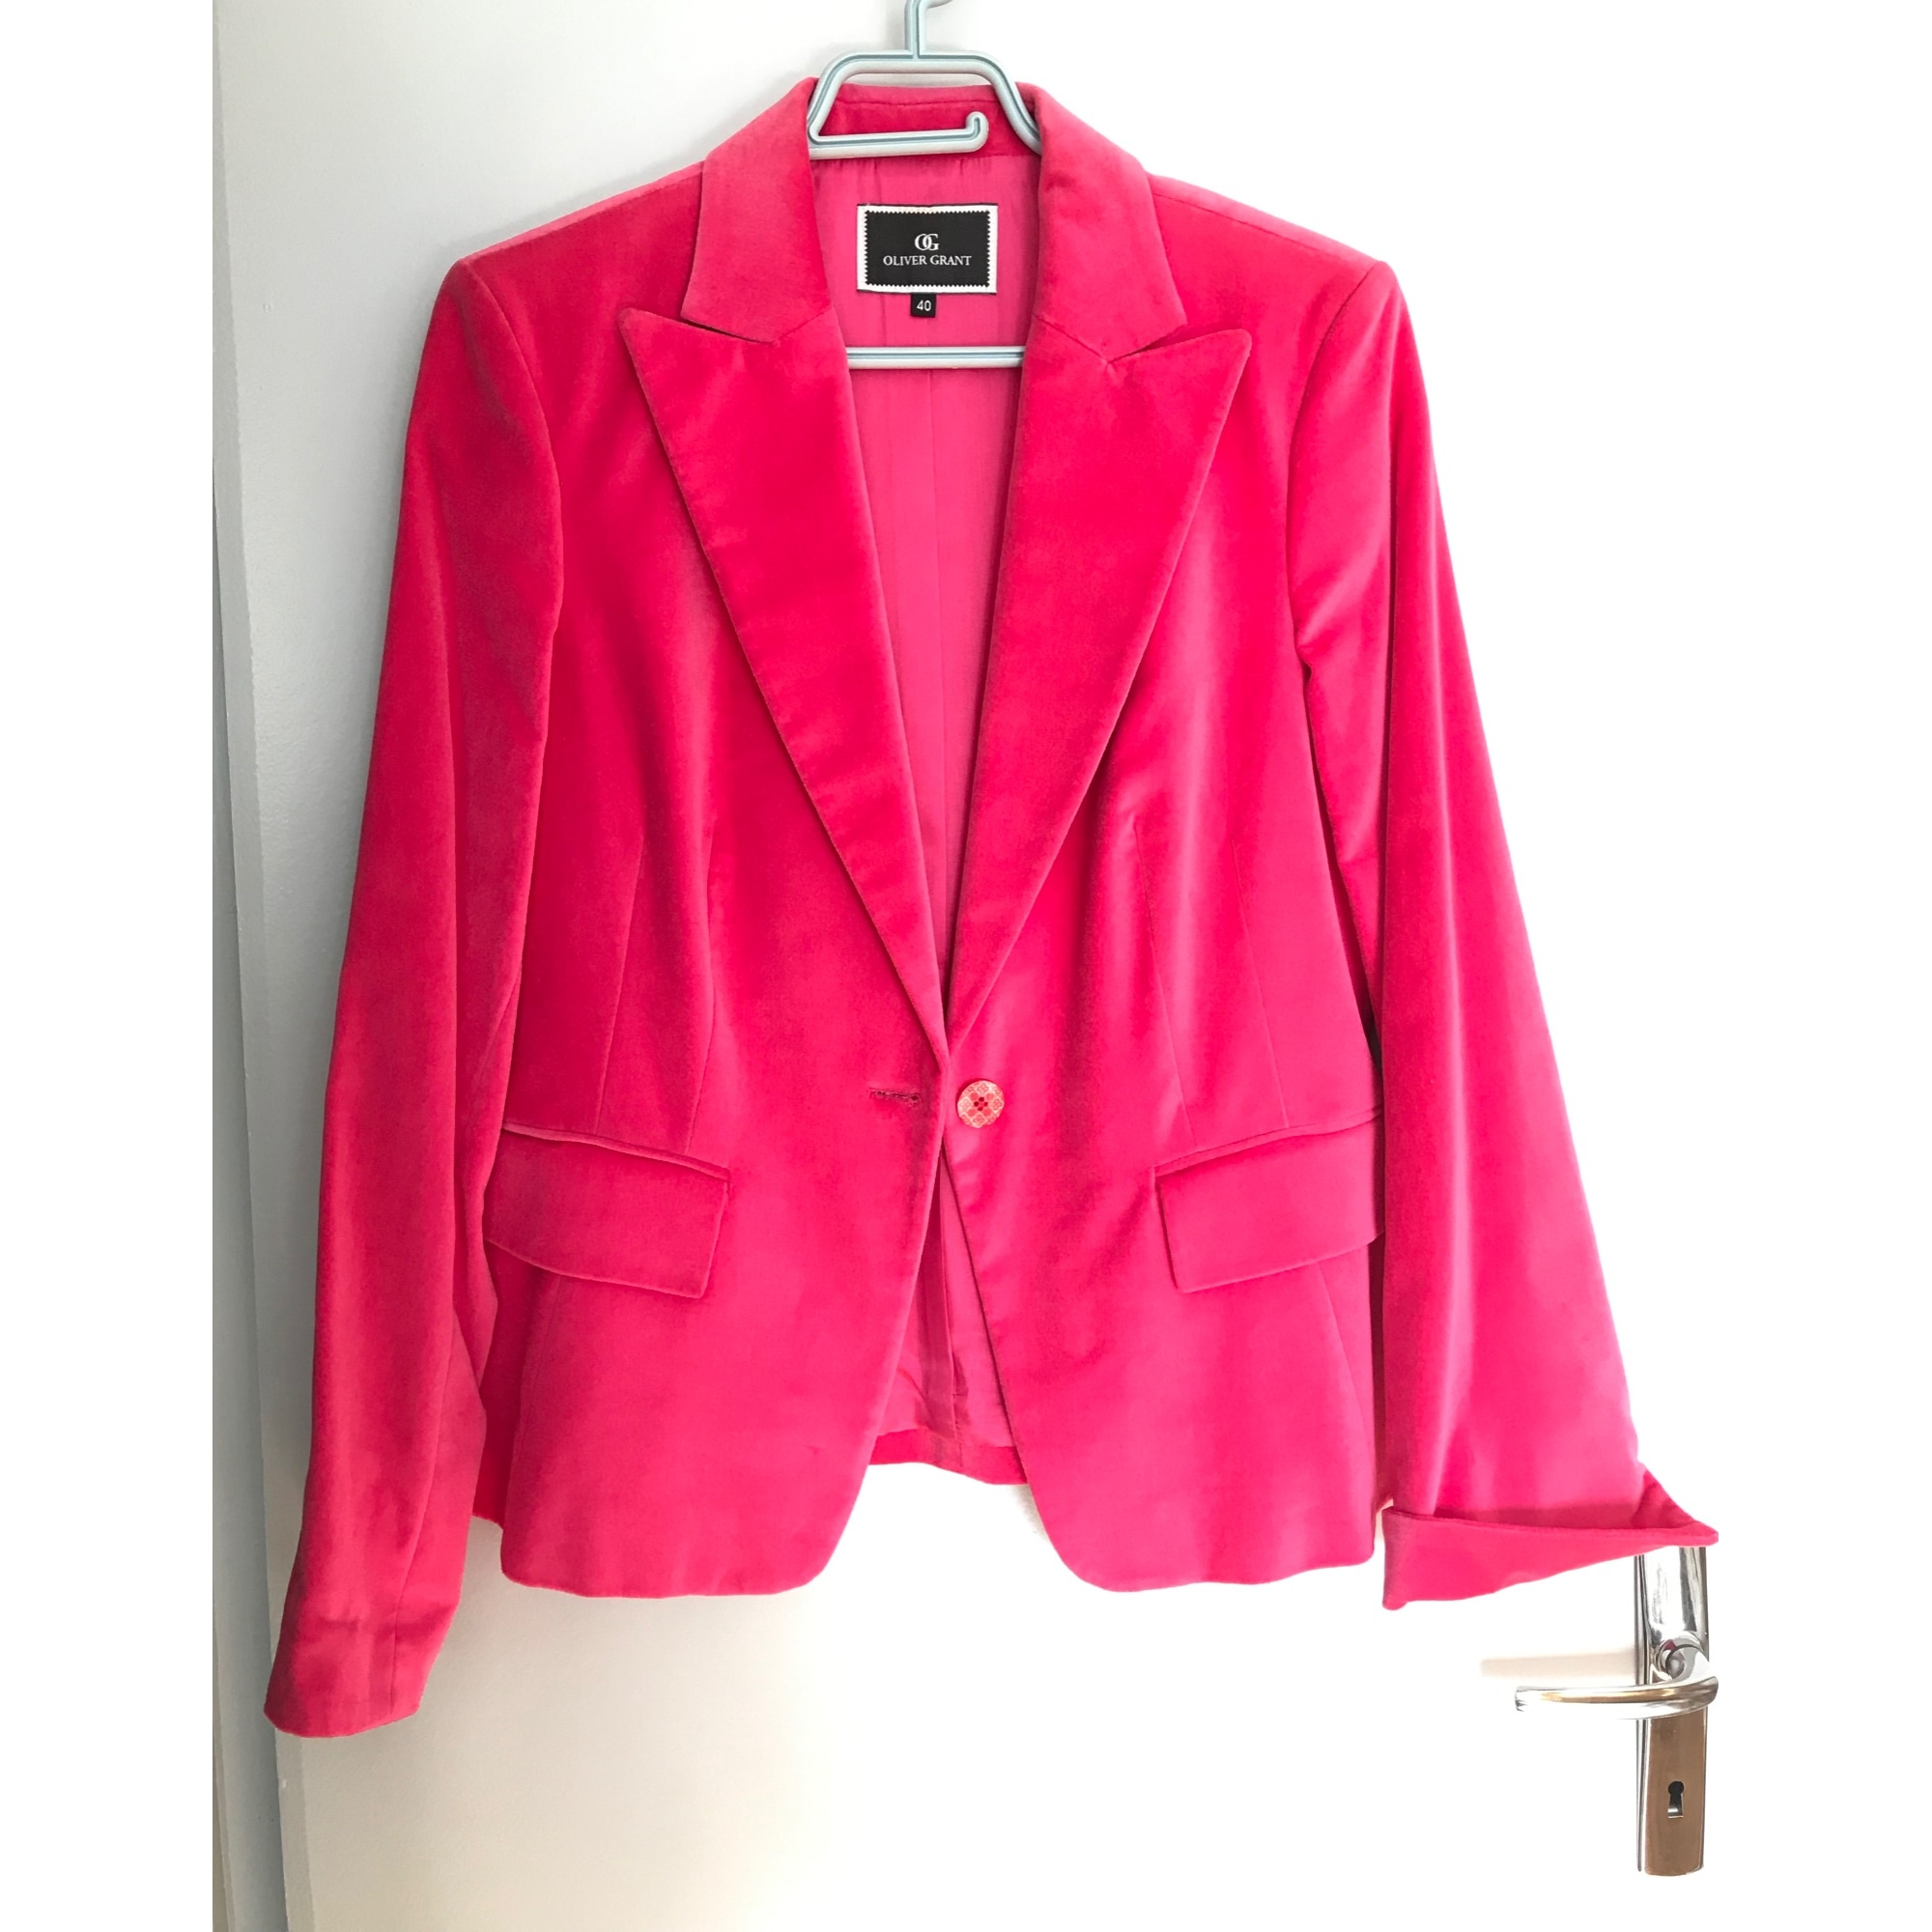 Blazer, veste tailleur OLIVIER GRANT Rose, fuschia, vieux rose